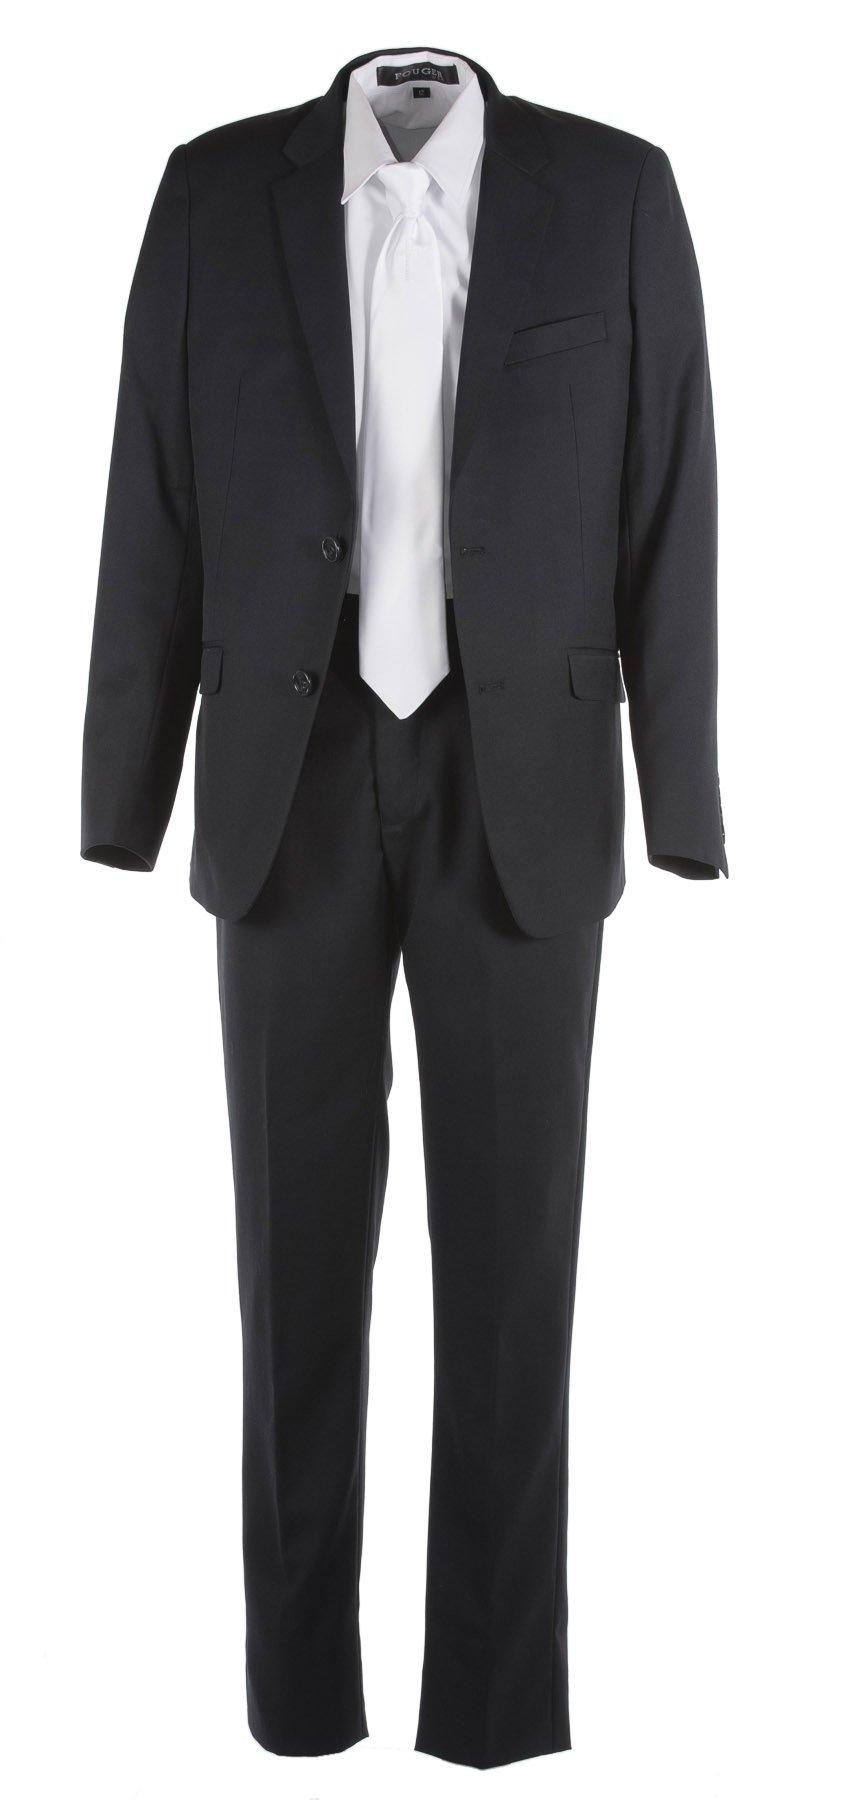 Tuxgear Boys Black Slim Fit Communion Suit With Religious Cross Dress Tie (Boys 16)